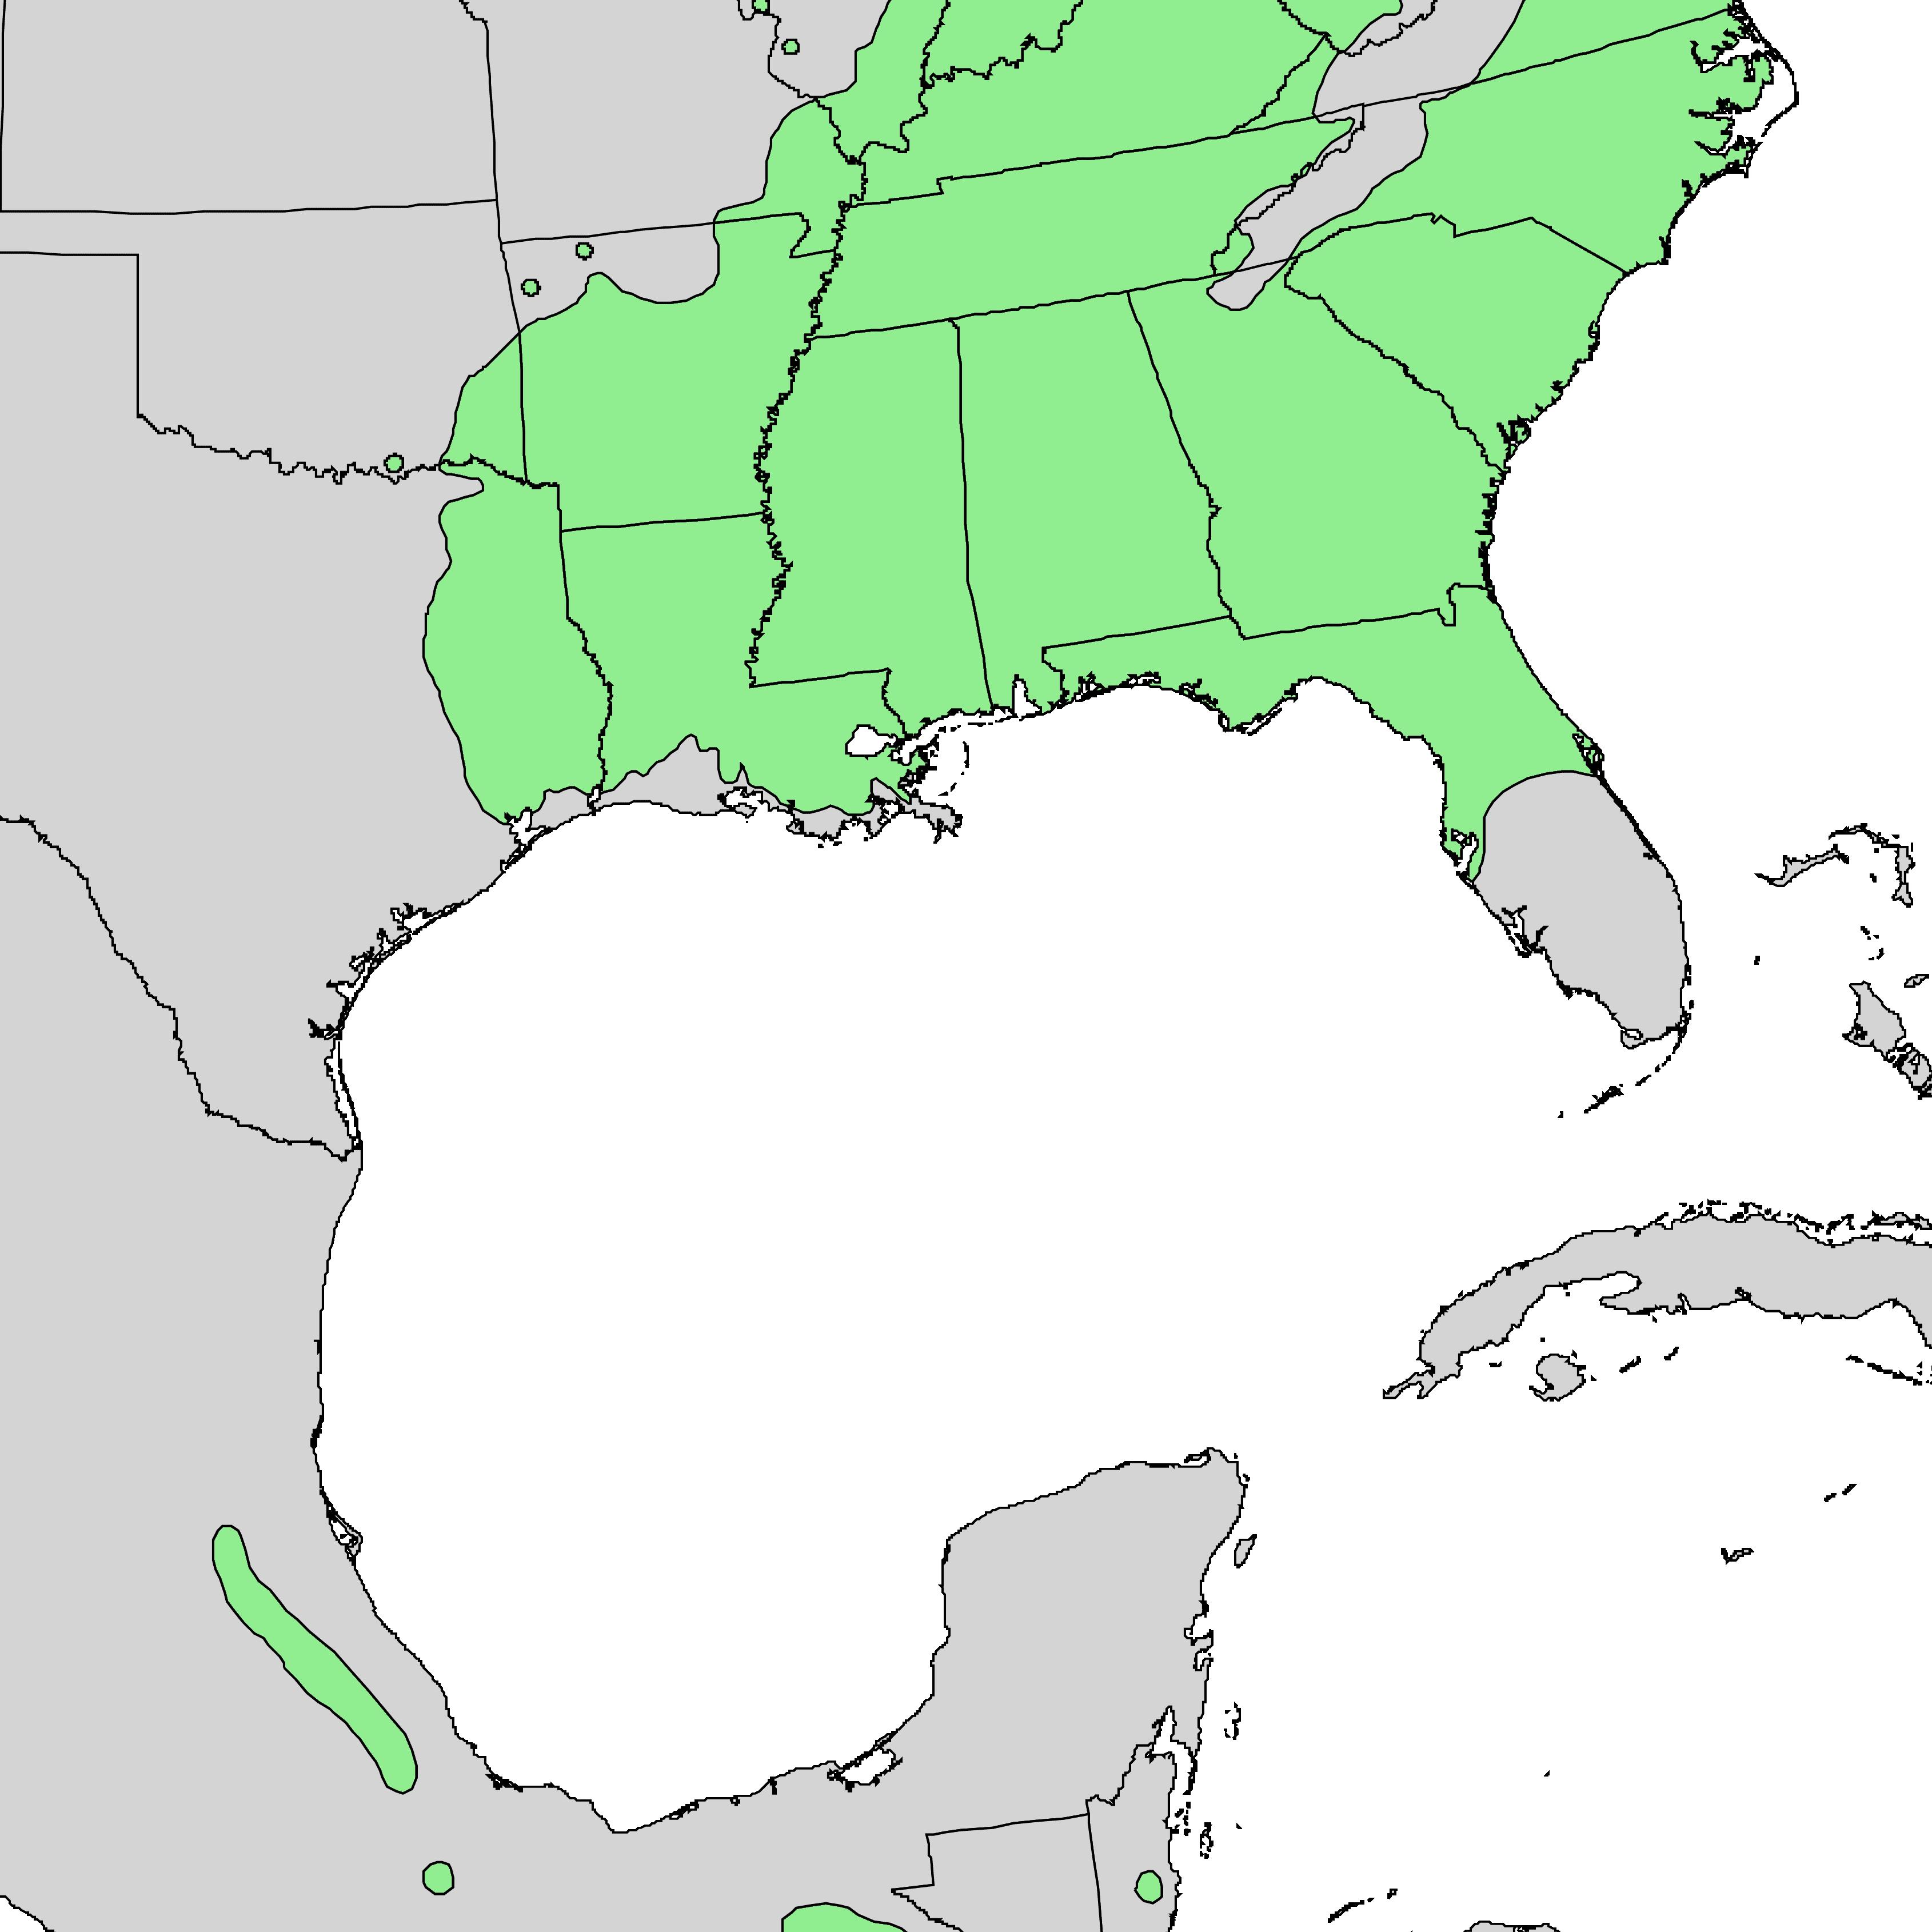 Sweetgum 100 Most Common North American Trees